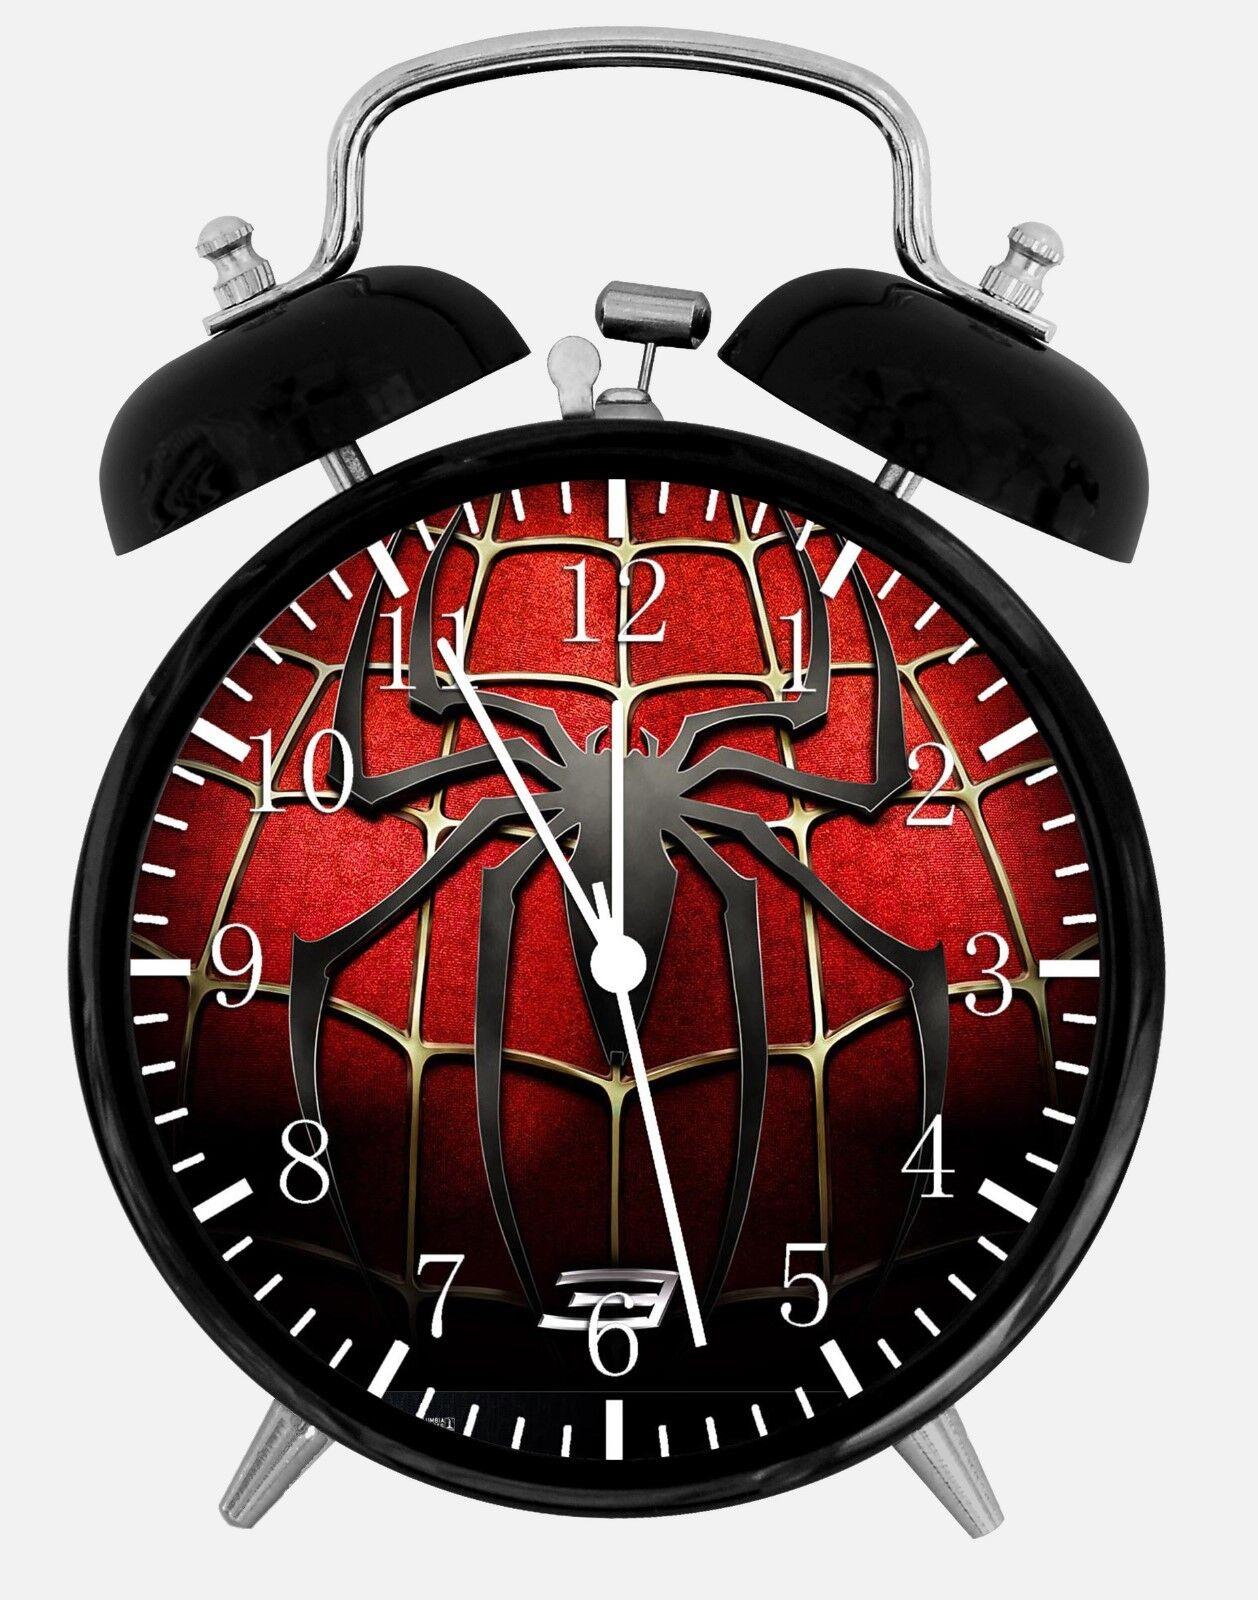 "Spiderman Spider Man Alarm Desk Clock 3.75"" Room Office Decor W148 Nice For Gift"